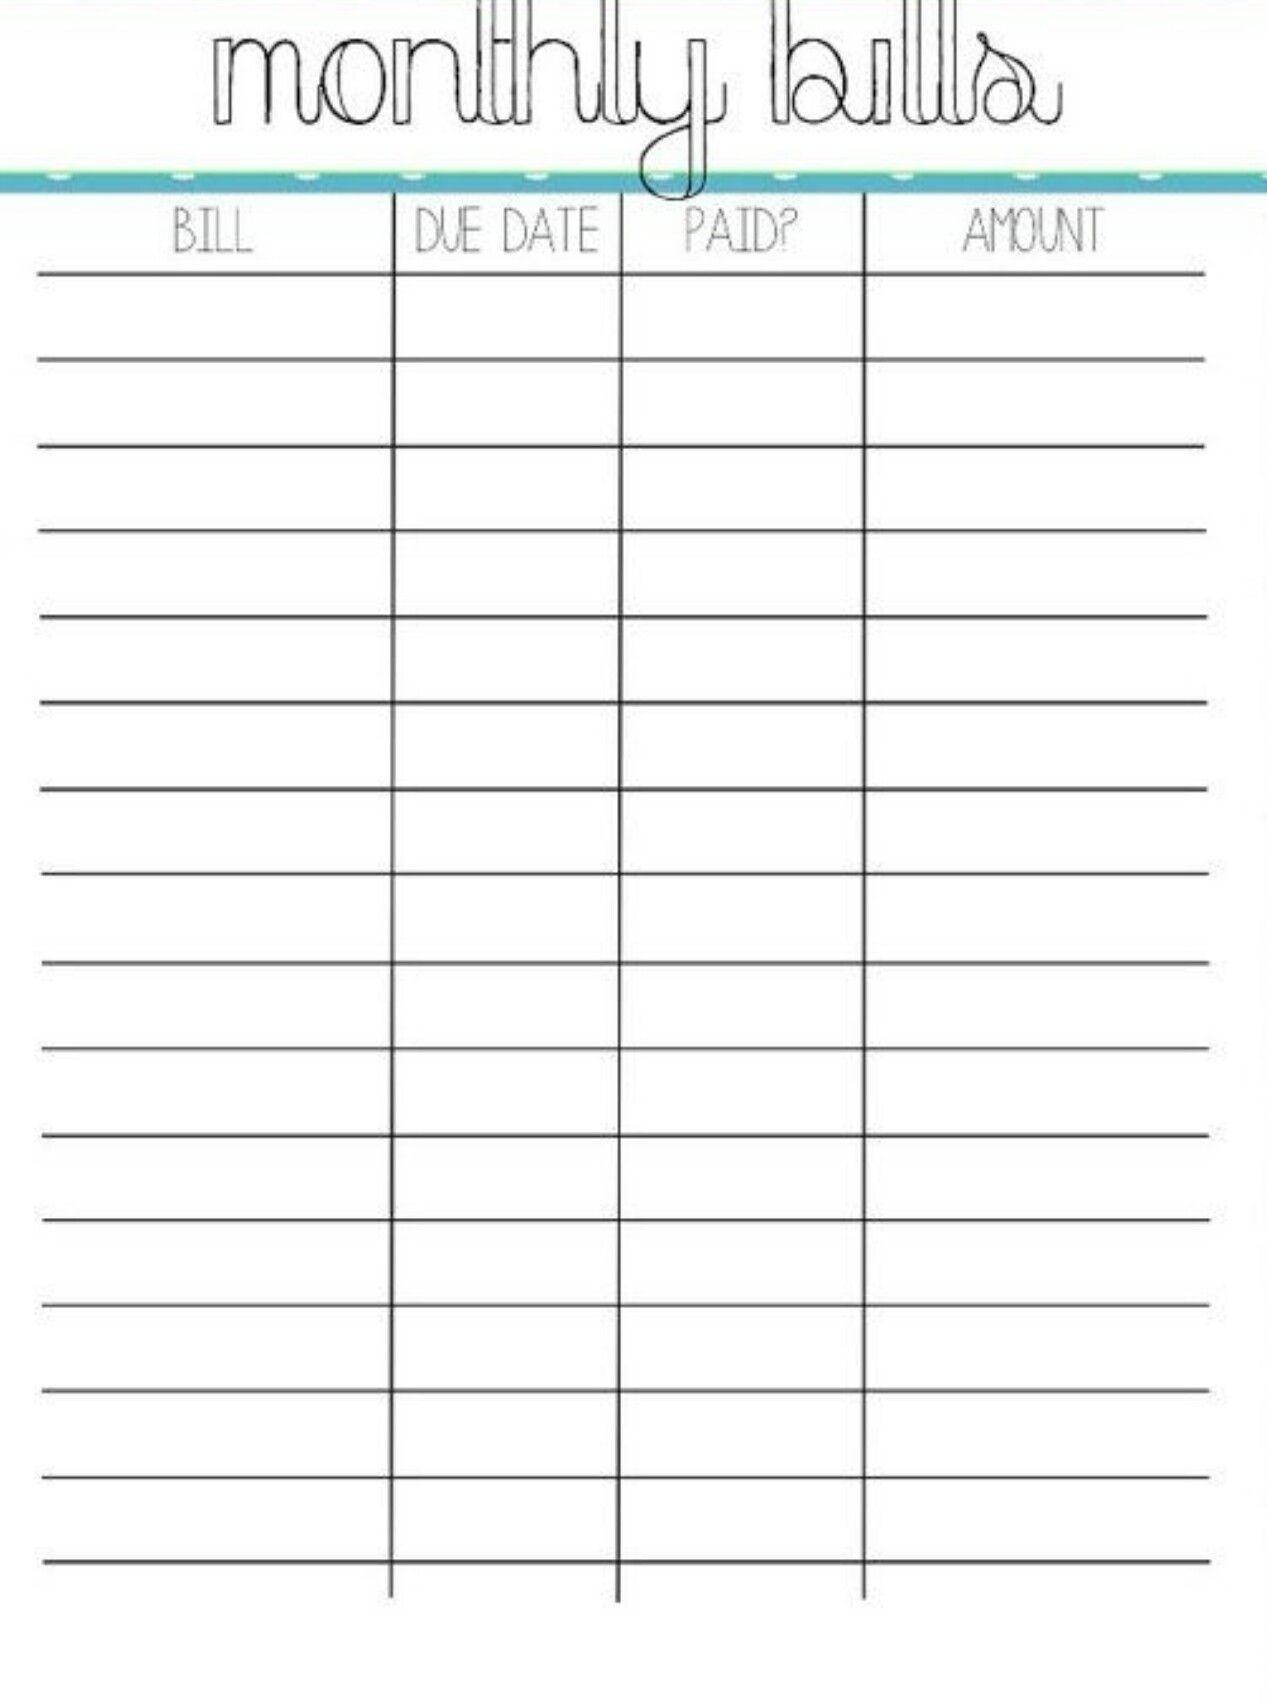 Monthly Bill Pay Calendar Printable